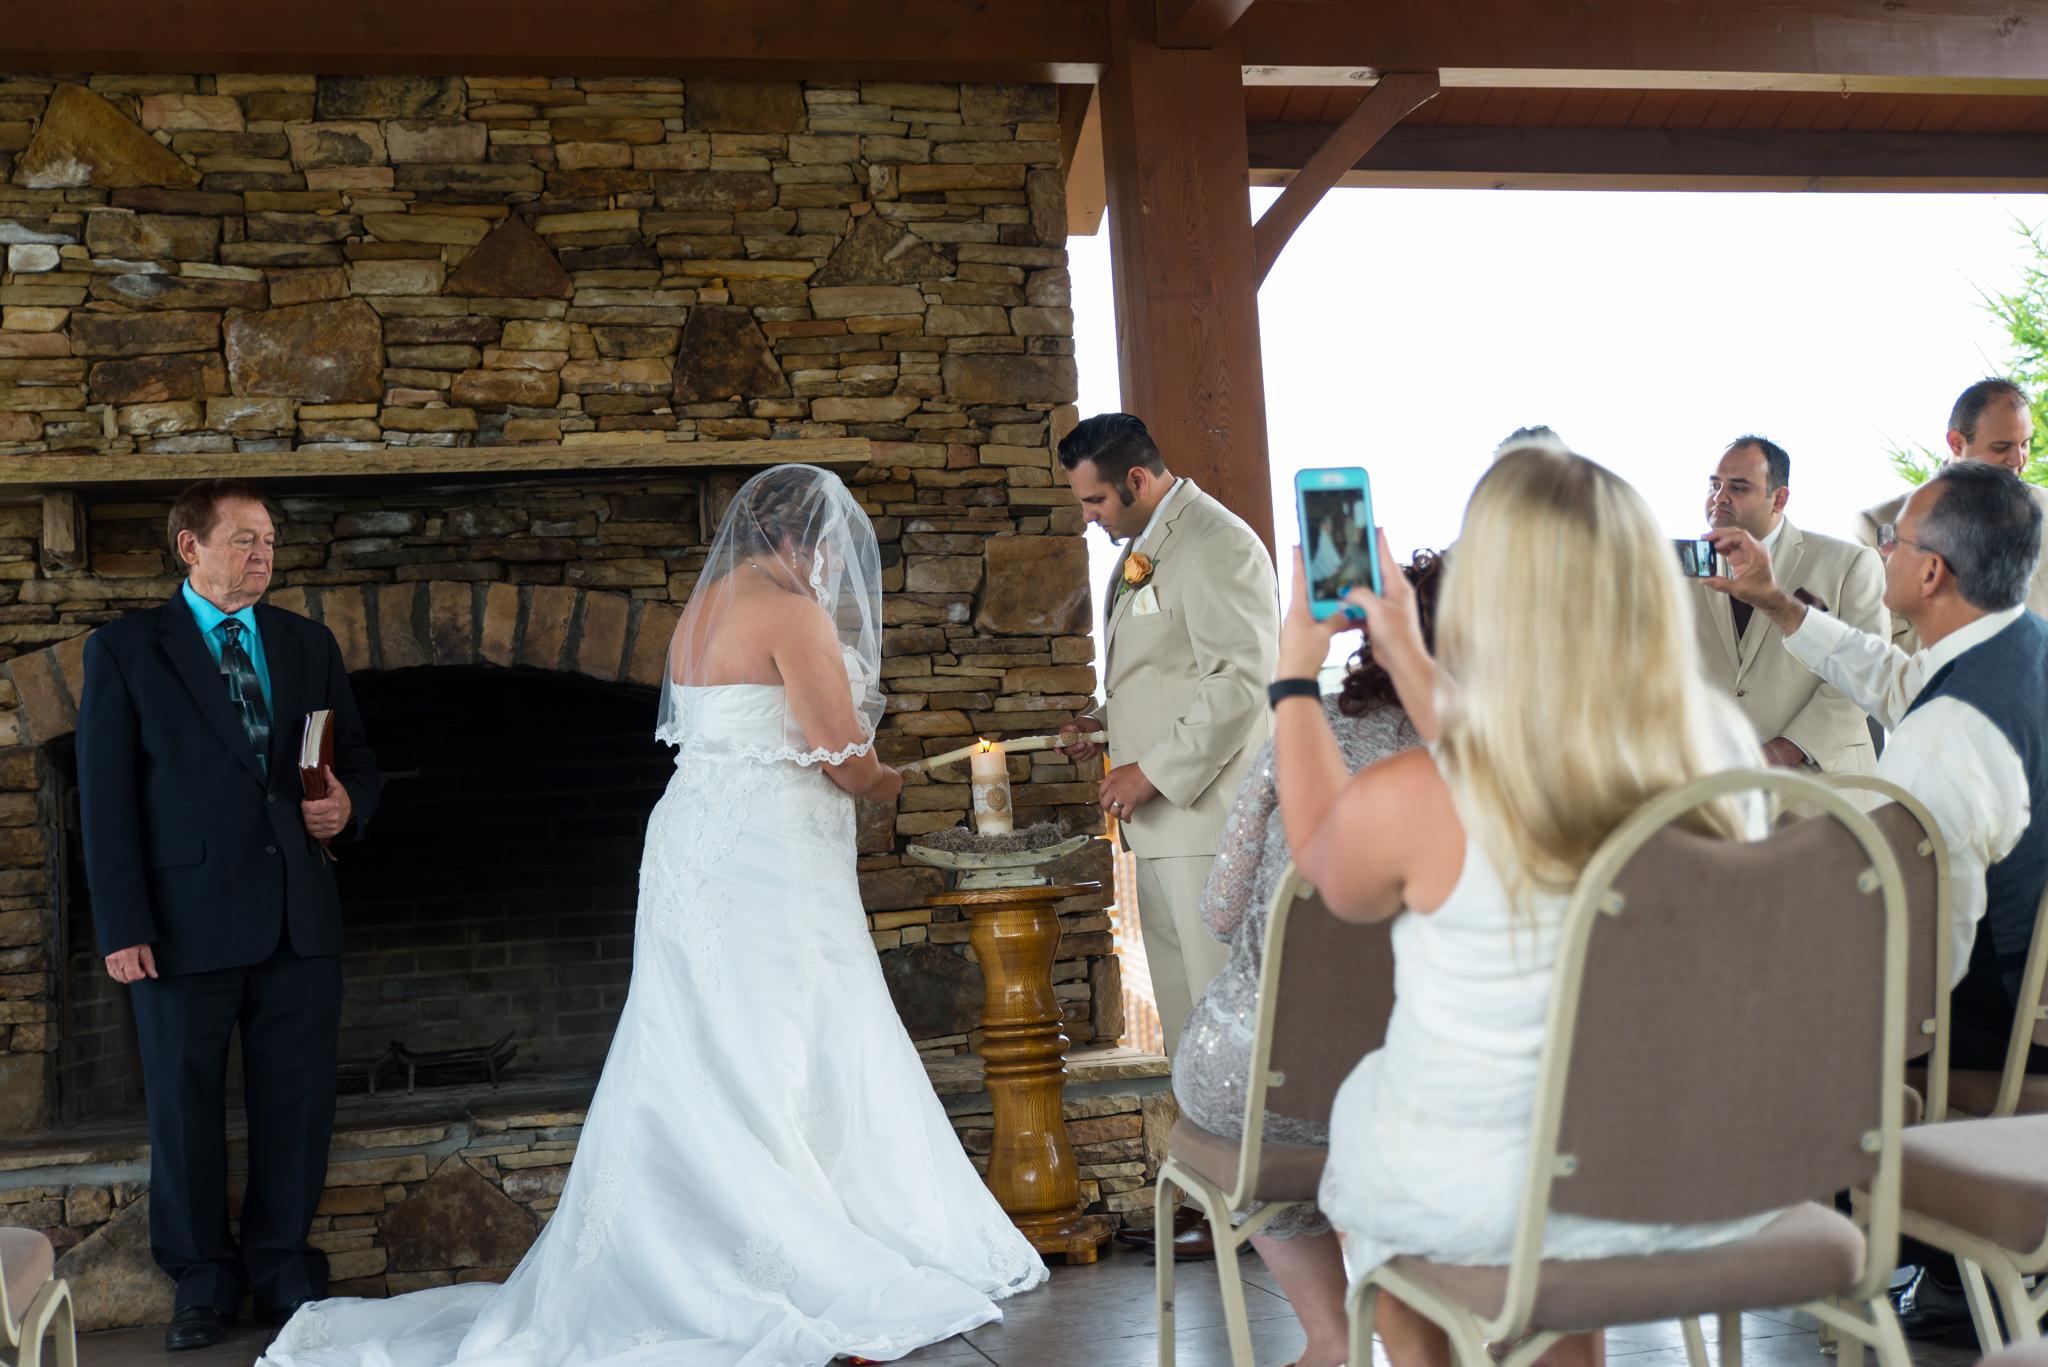 Bride and groom lighting unity candle at Gatlinburg, TN wedding